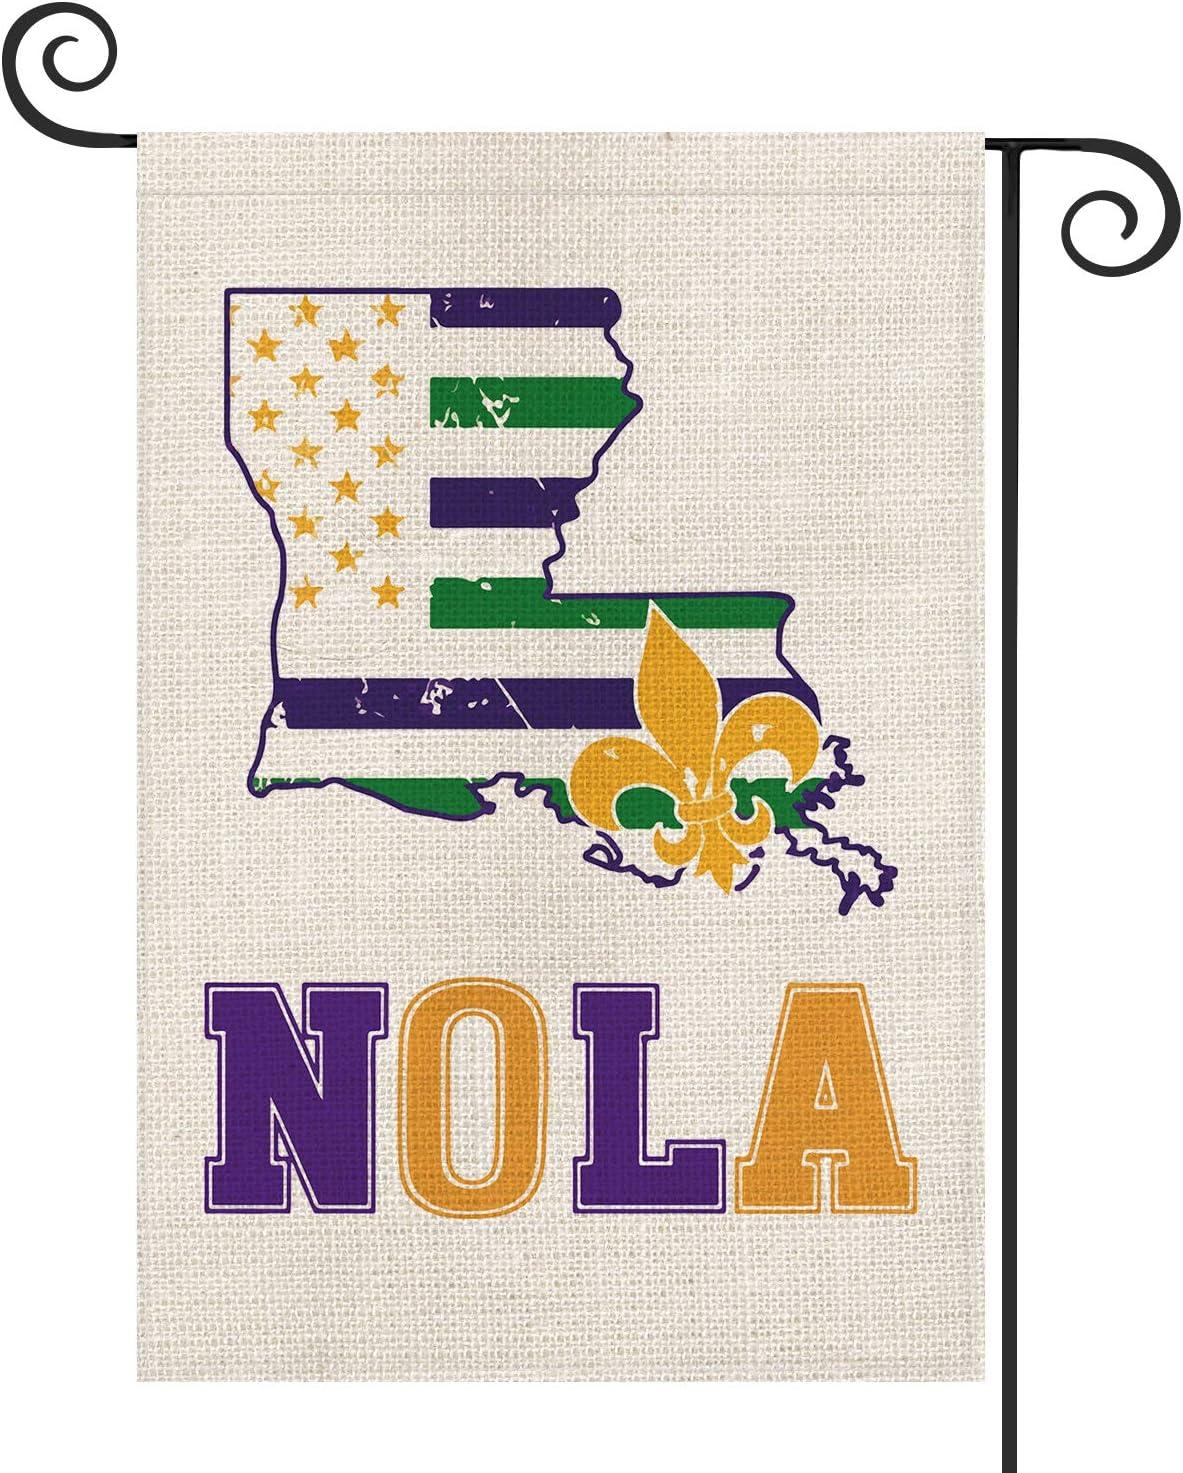 AVOIN NOLA Fleur de Lis New Orleans Garden Flag Vertical Double Sized, Mardi Gras Party Louisiana State Map Yard Outdoor Decoration 12.5 x 18 Inch